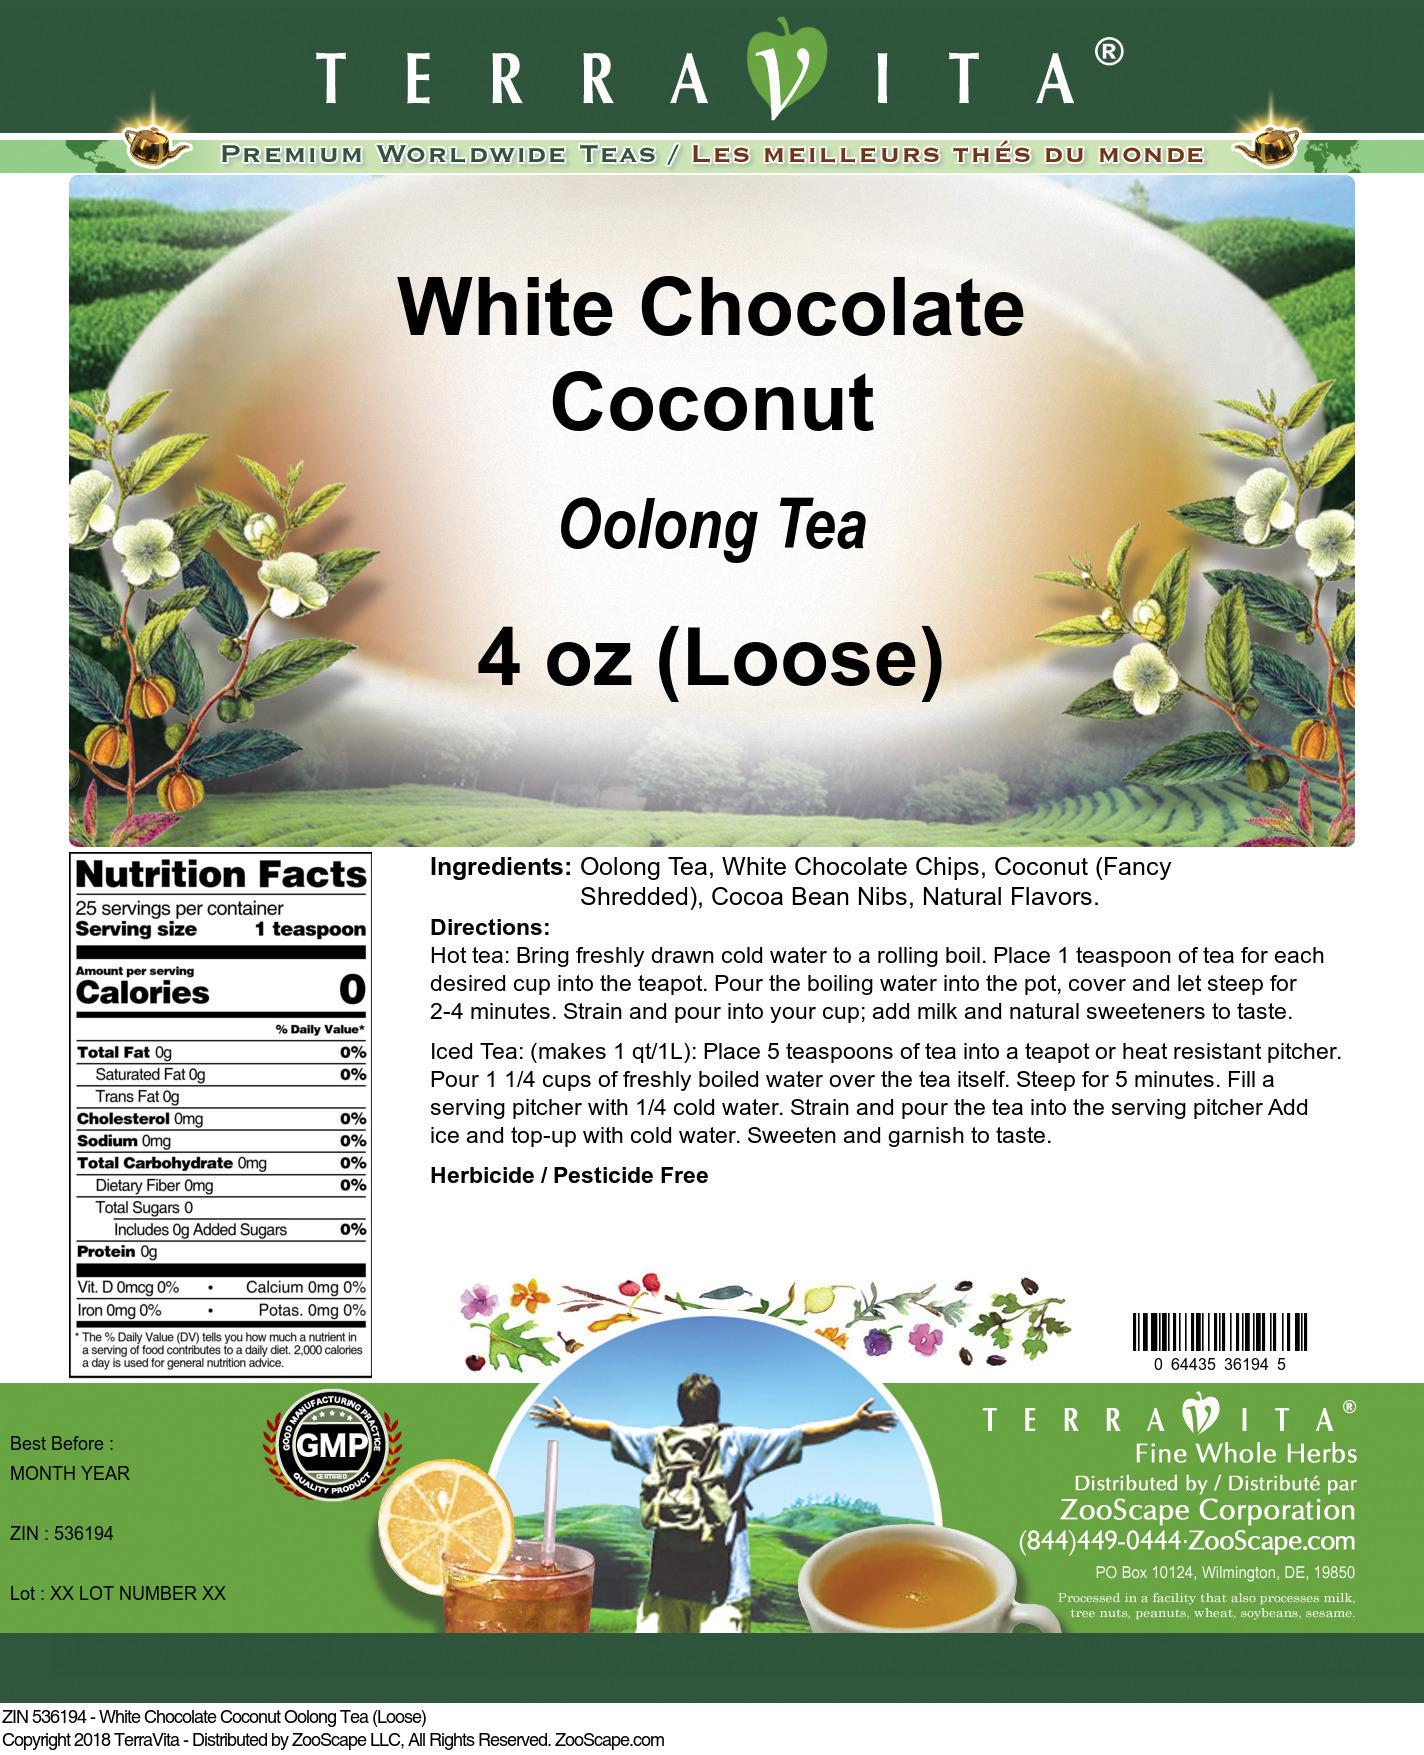 White Chocolate Coconut Oolong Tea (Loose)